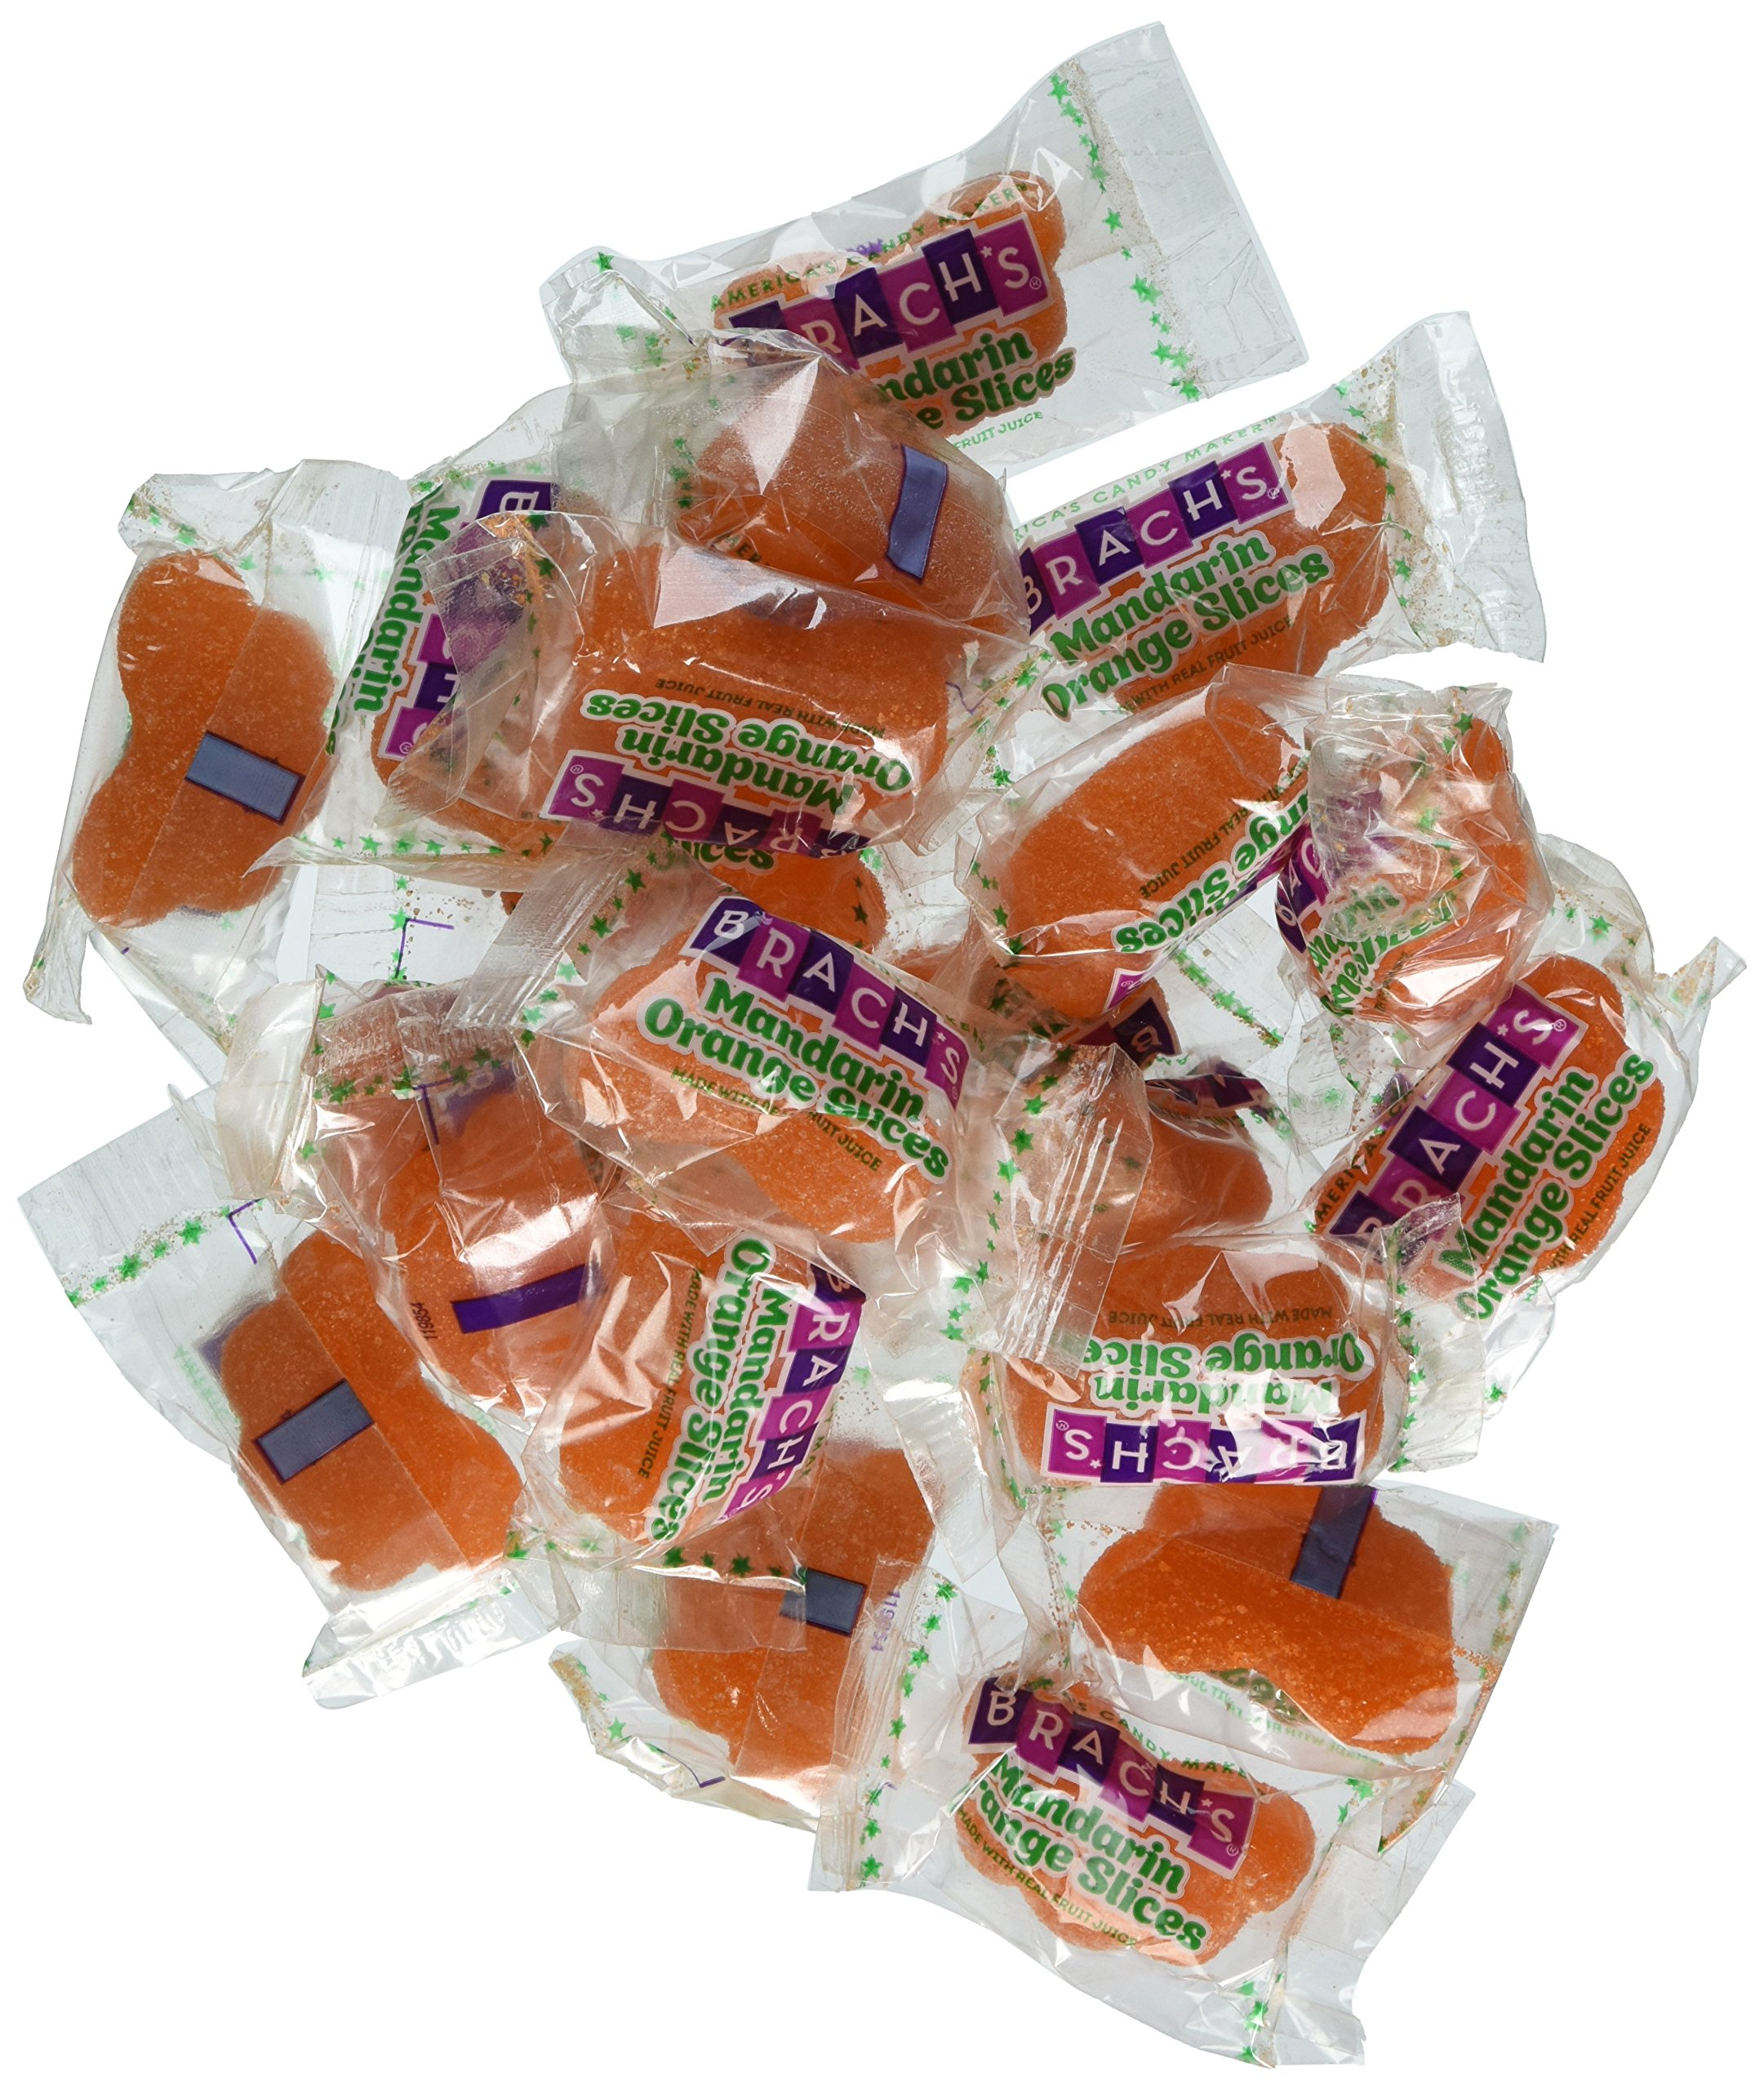 Brach's Mandarin Orange Slices Gummy Candy, 6.89 Pound Bulk Candy Bag